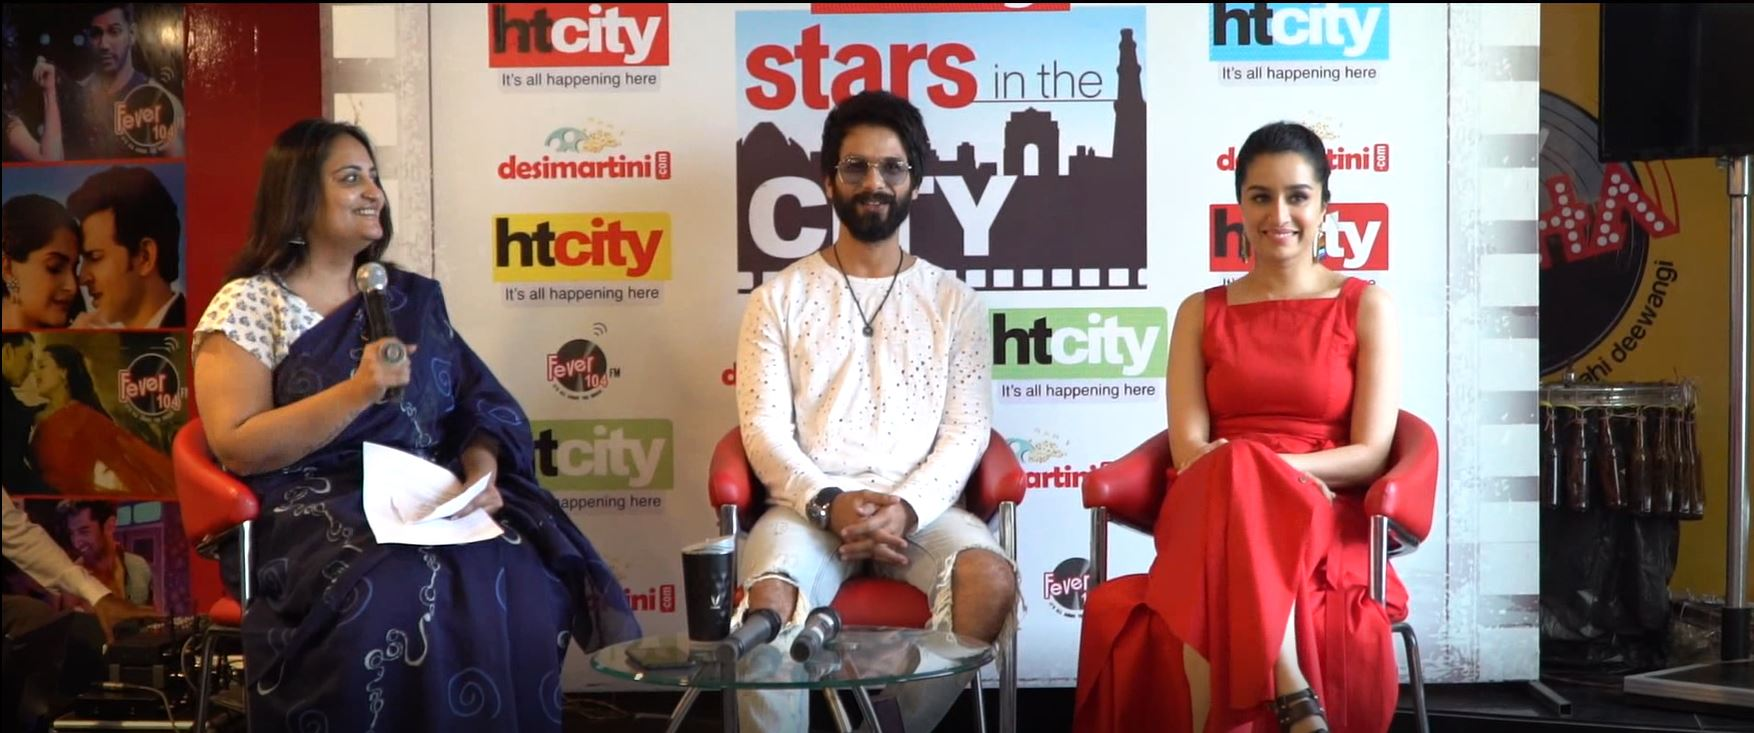 Shahid Kapoor and Shraddha Kapoor for Batti Gul Meter Chalu